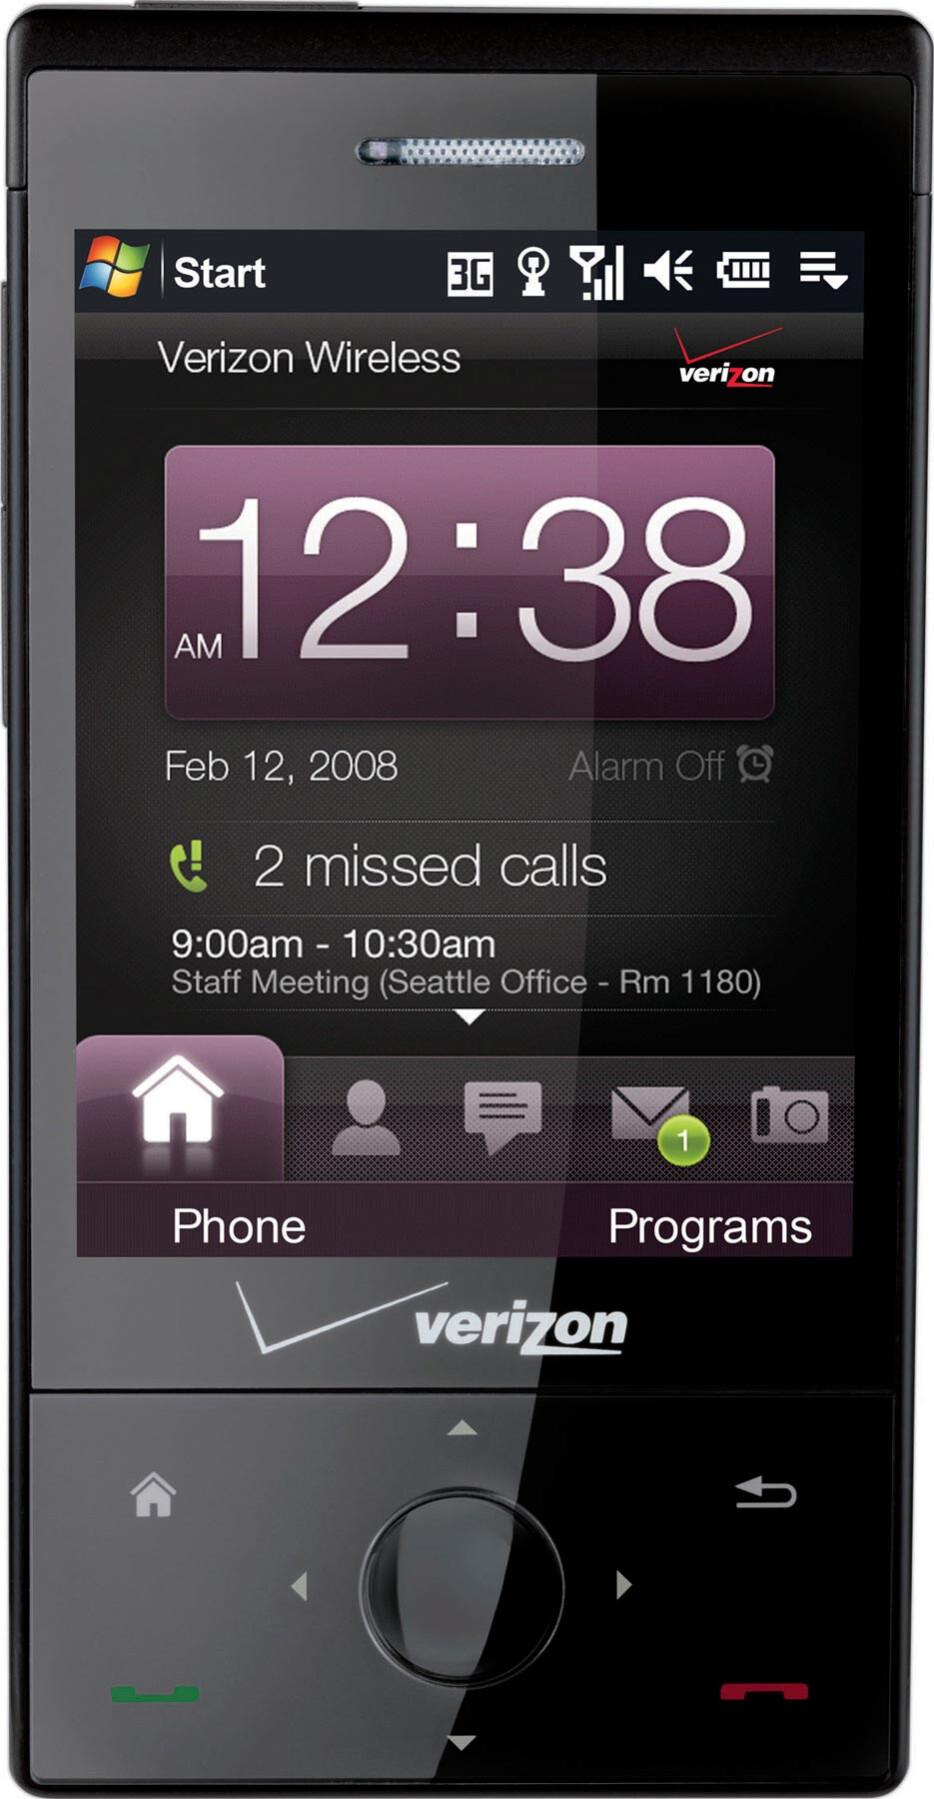 HTC Touch Diamond CDMA - Verizon